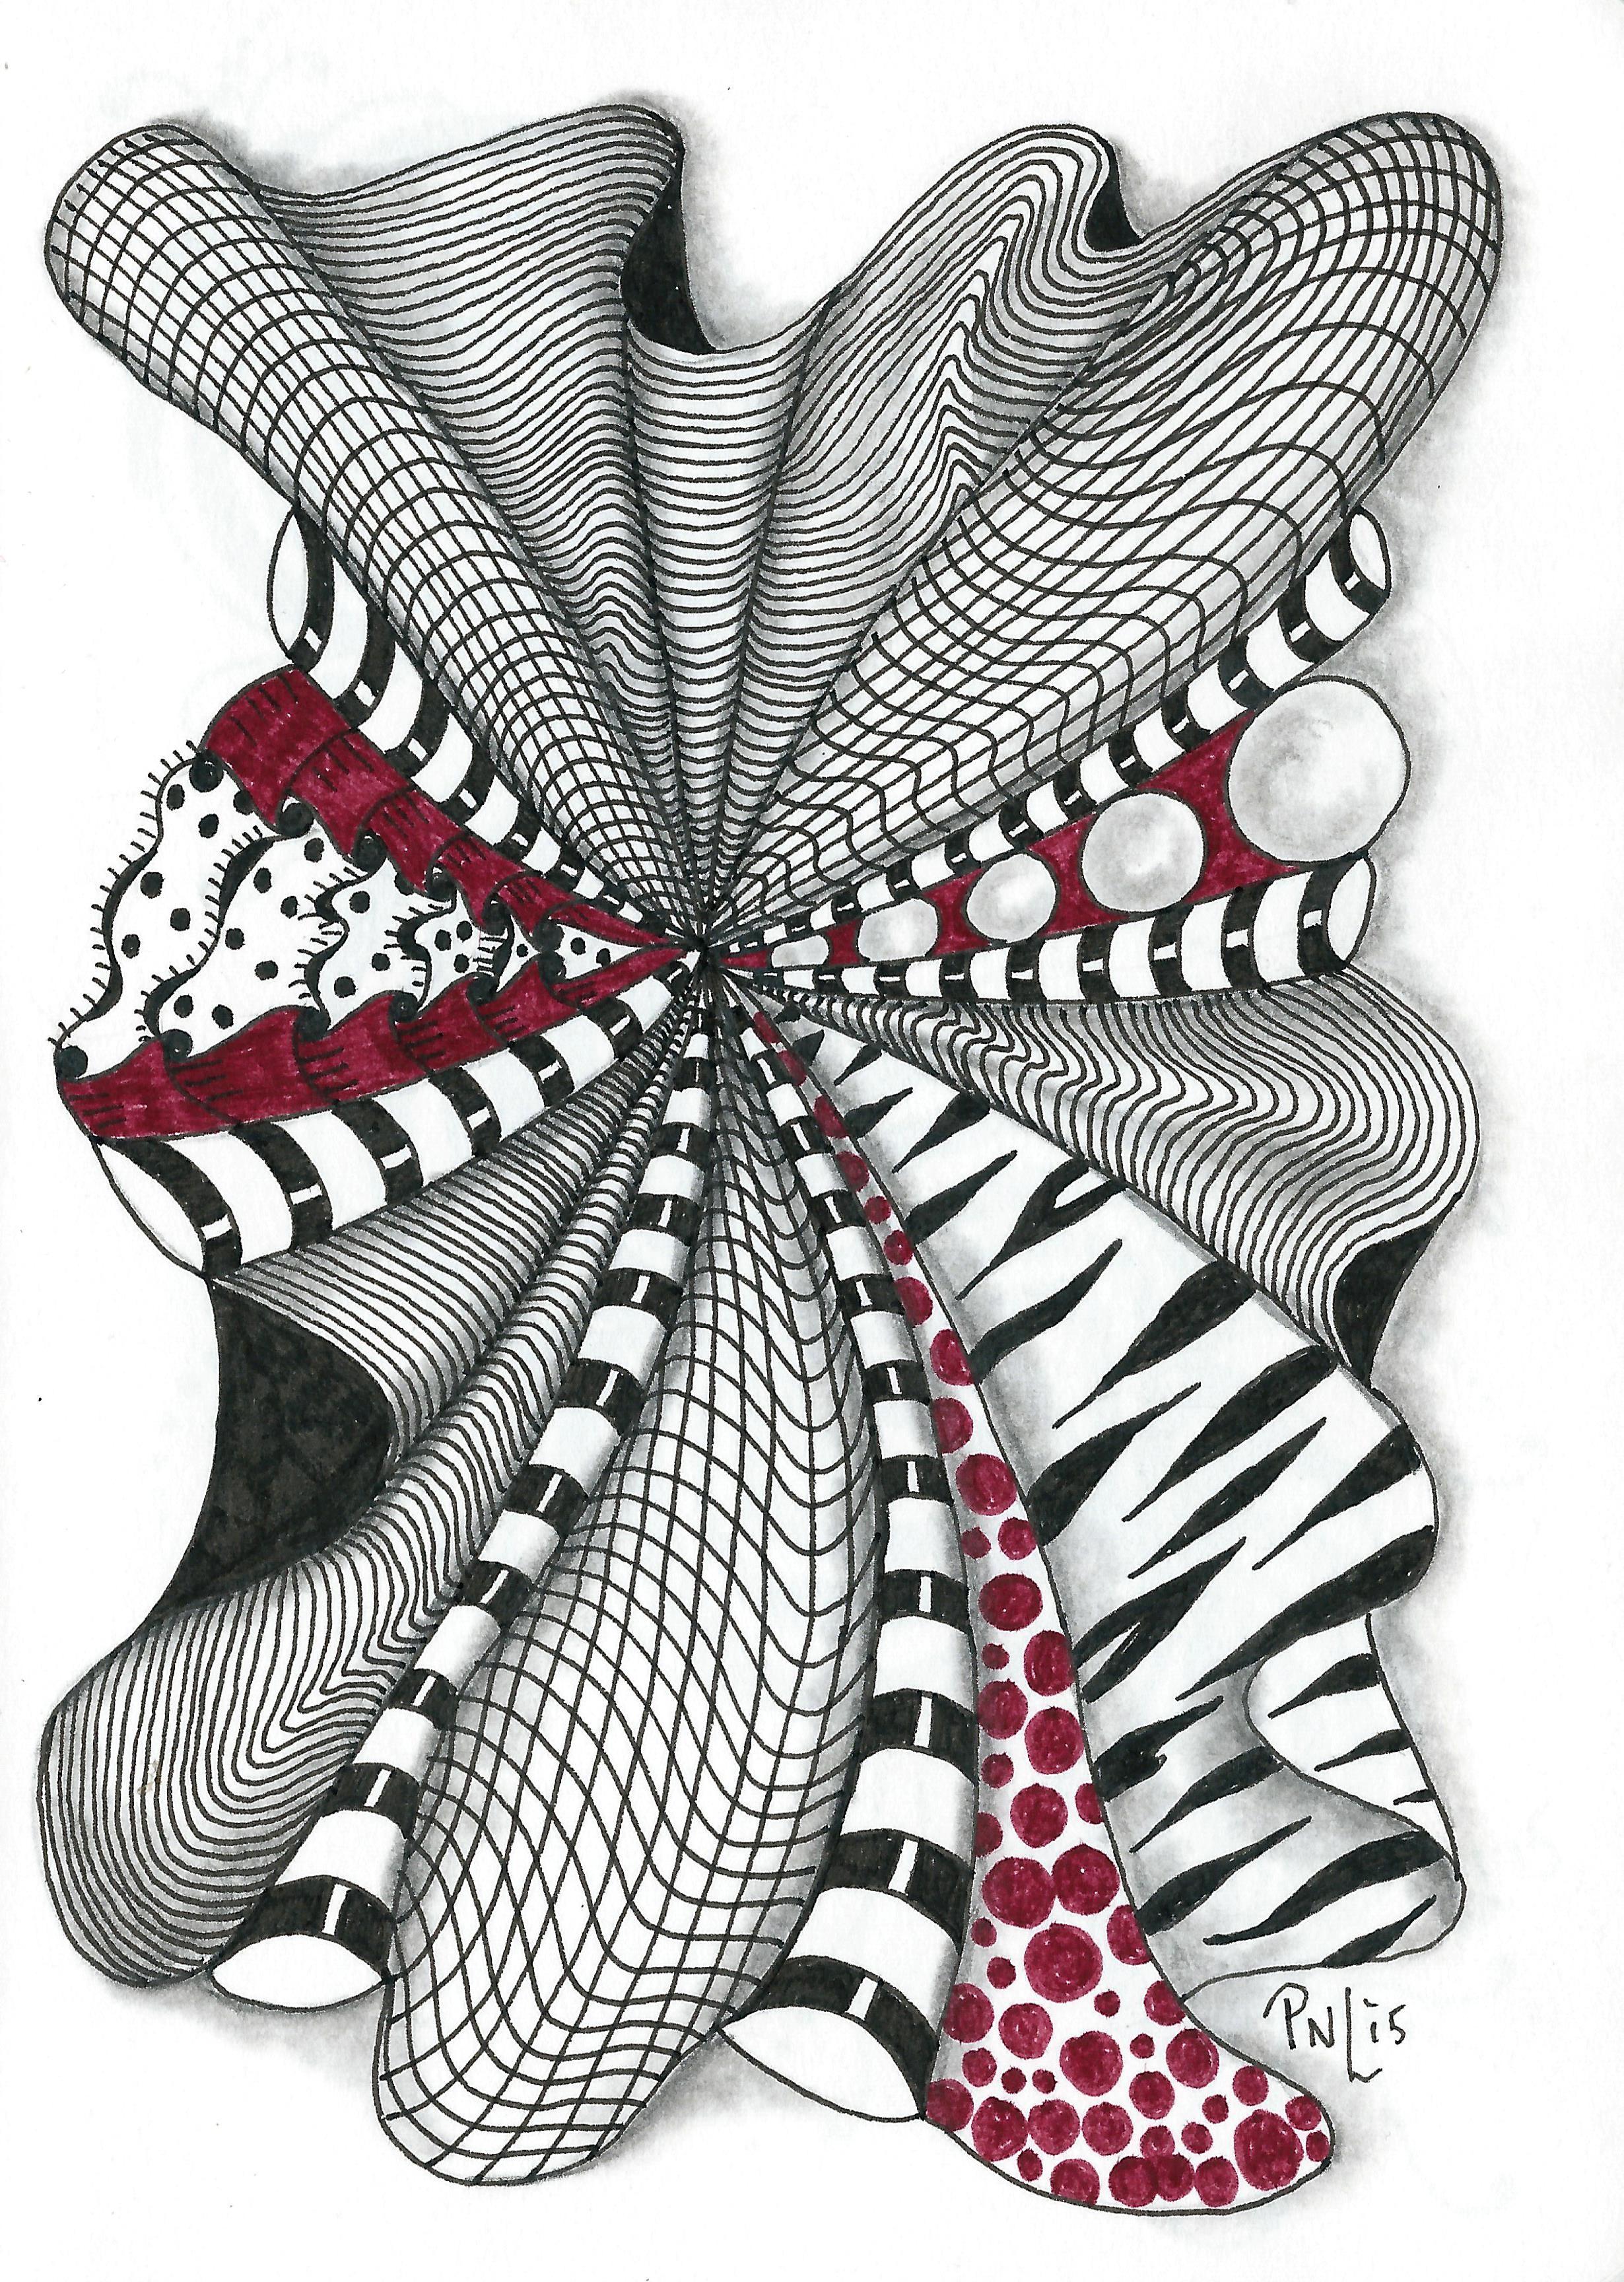 Pin by renča on zentagle barevné pinterest zentangles doodles